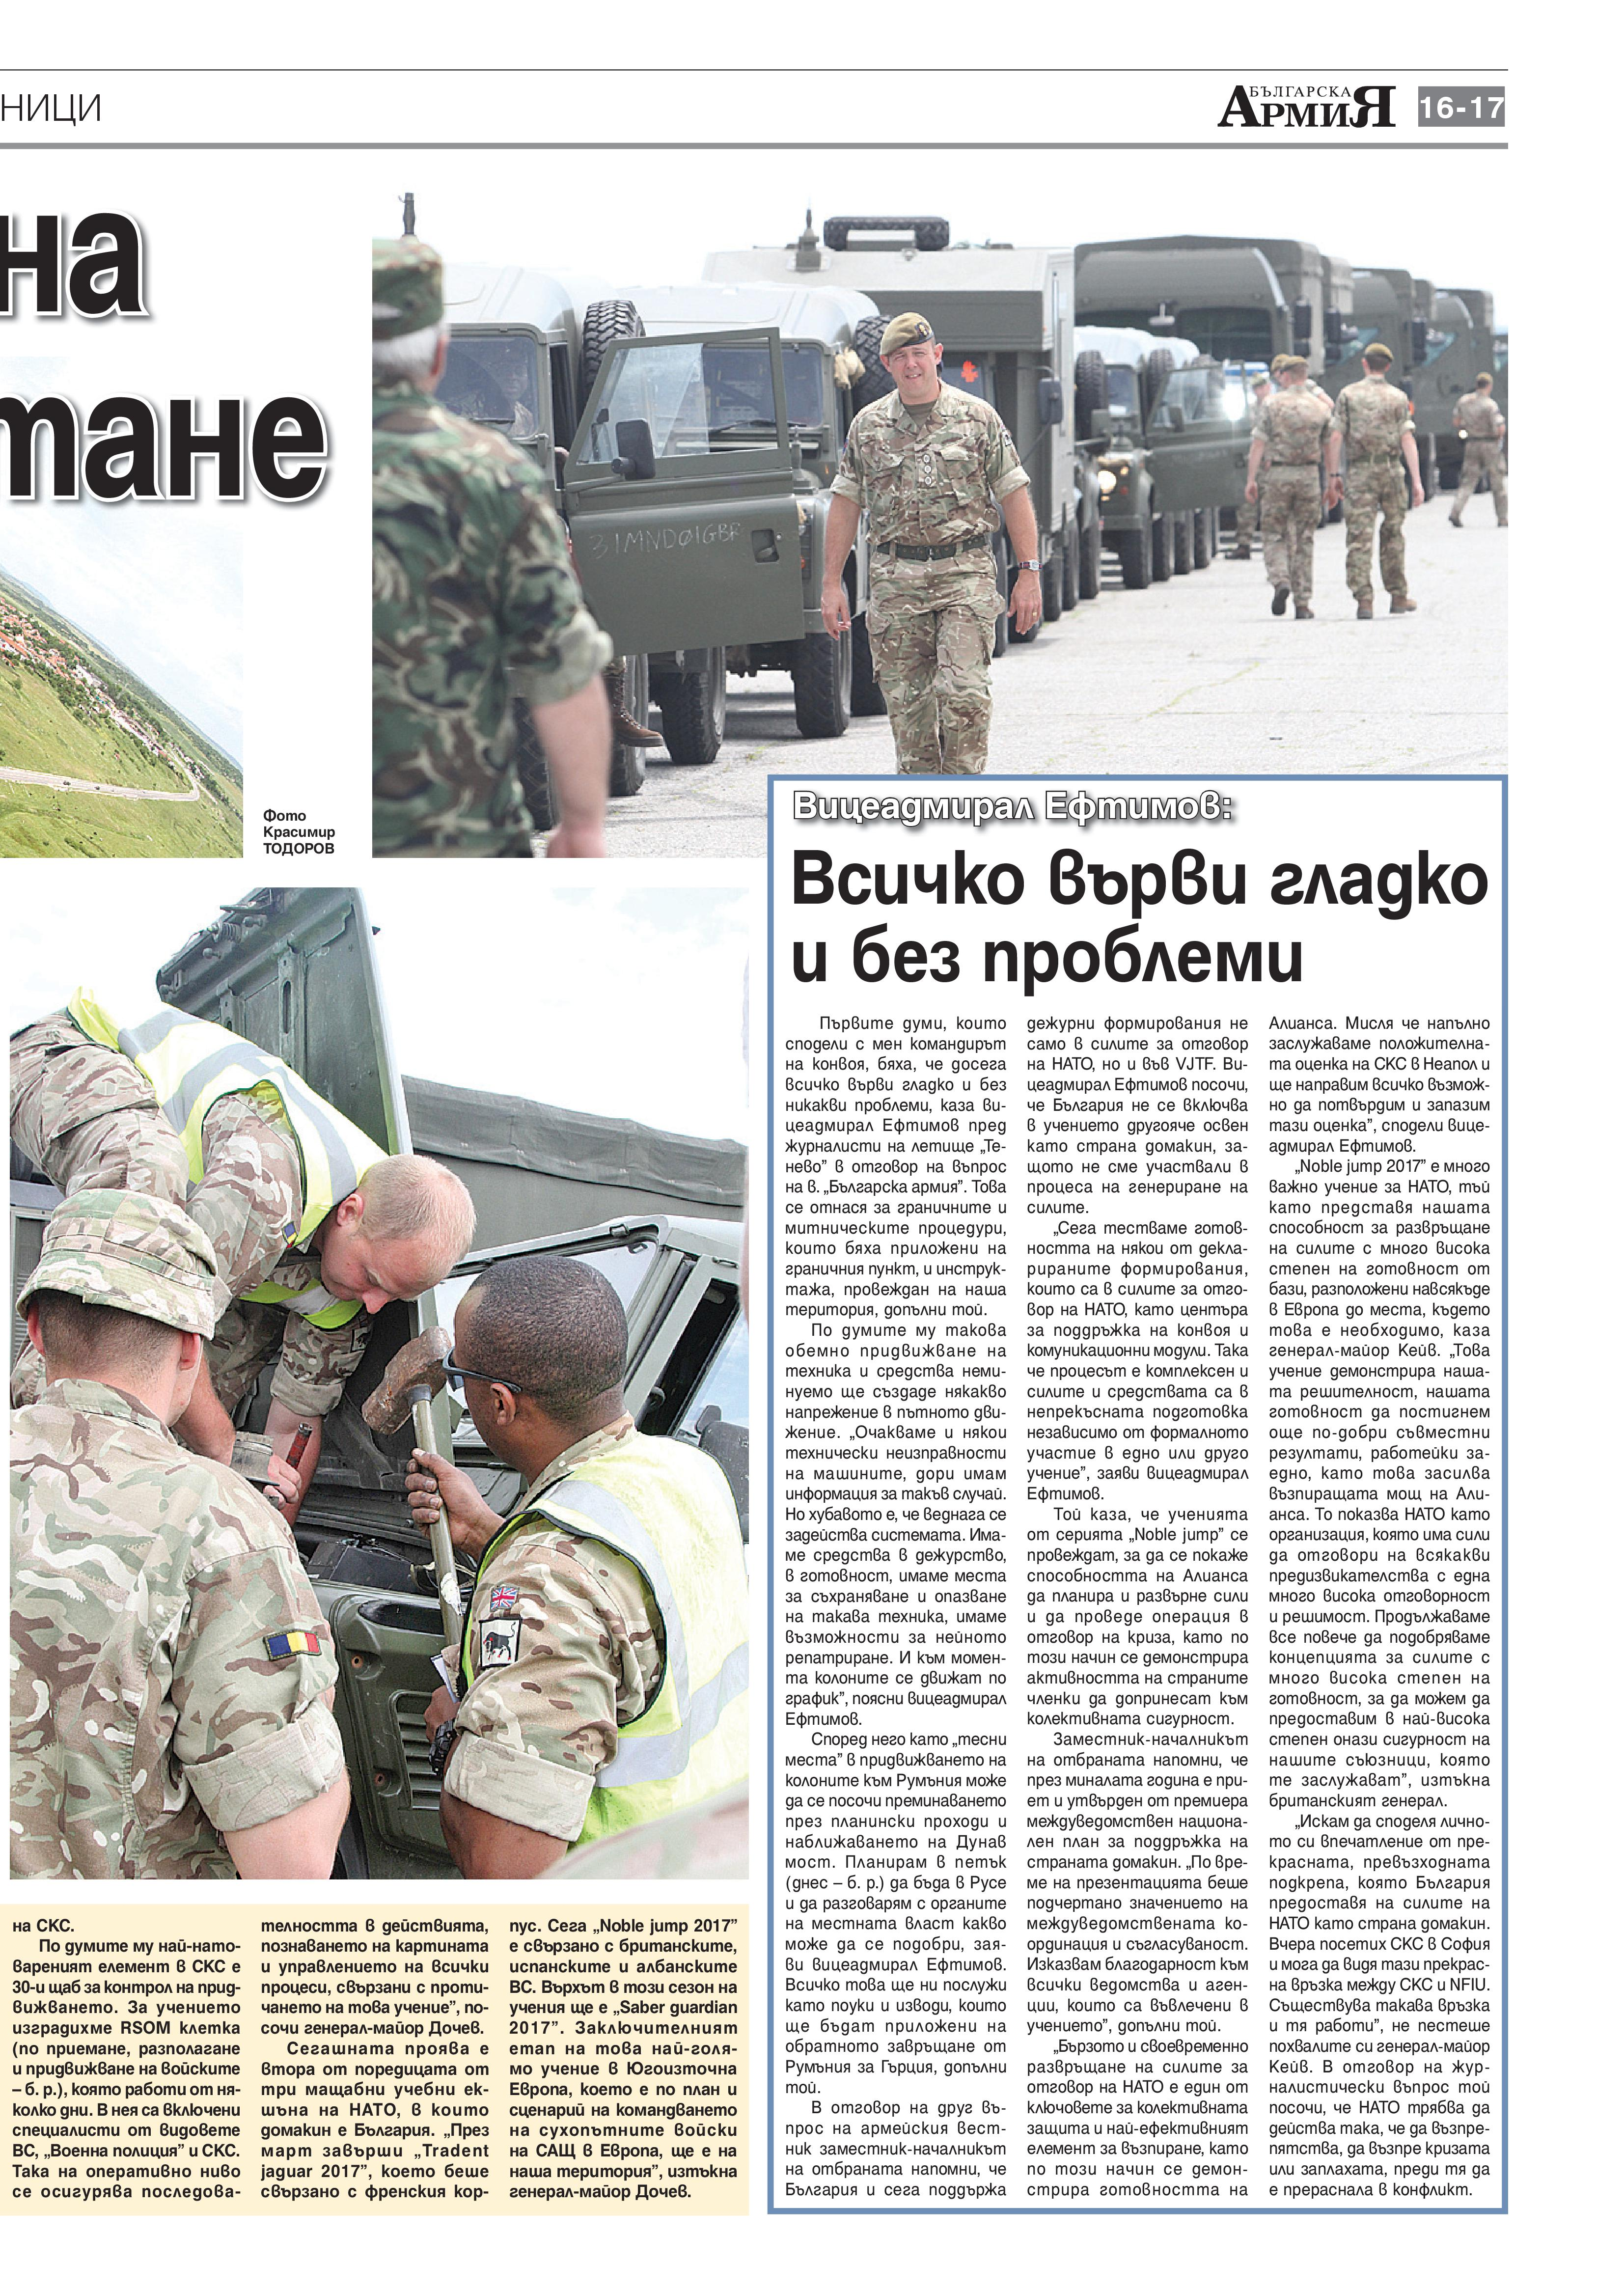 https://www.armymedia.bg/wp-content/uploads/2015/06/17-6.jpg